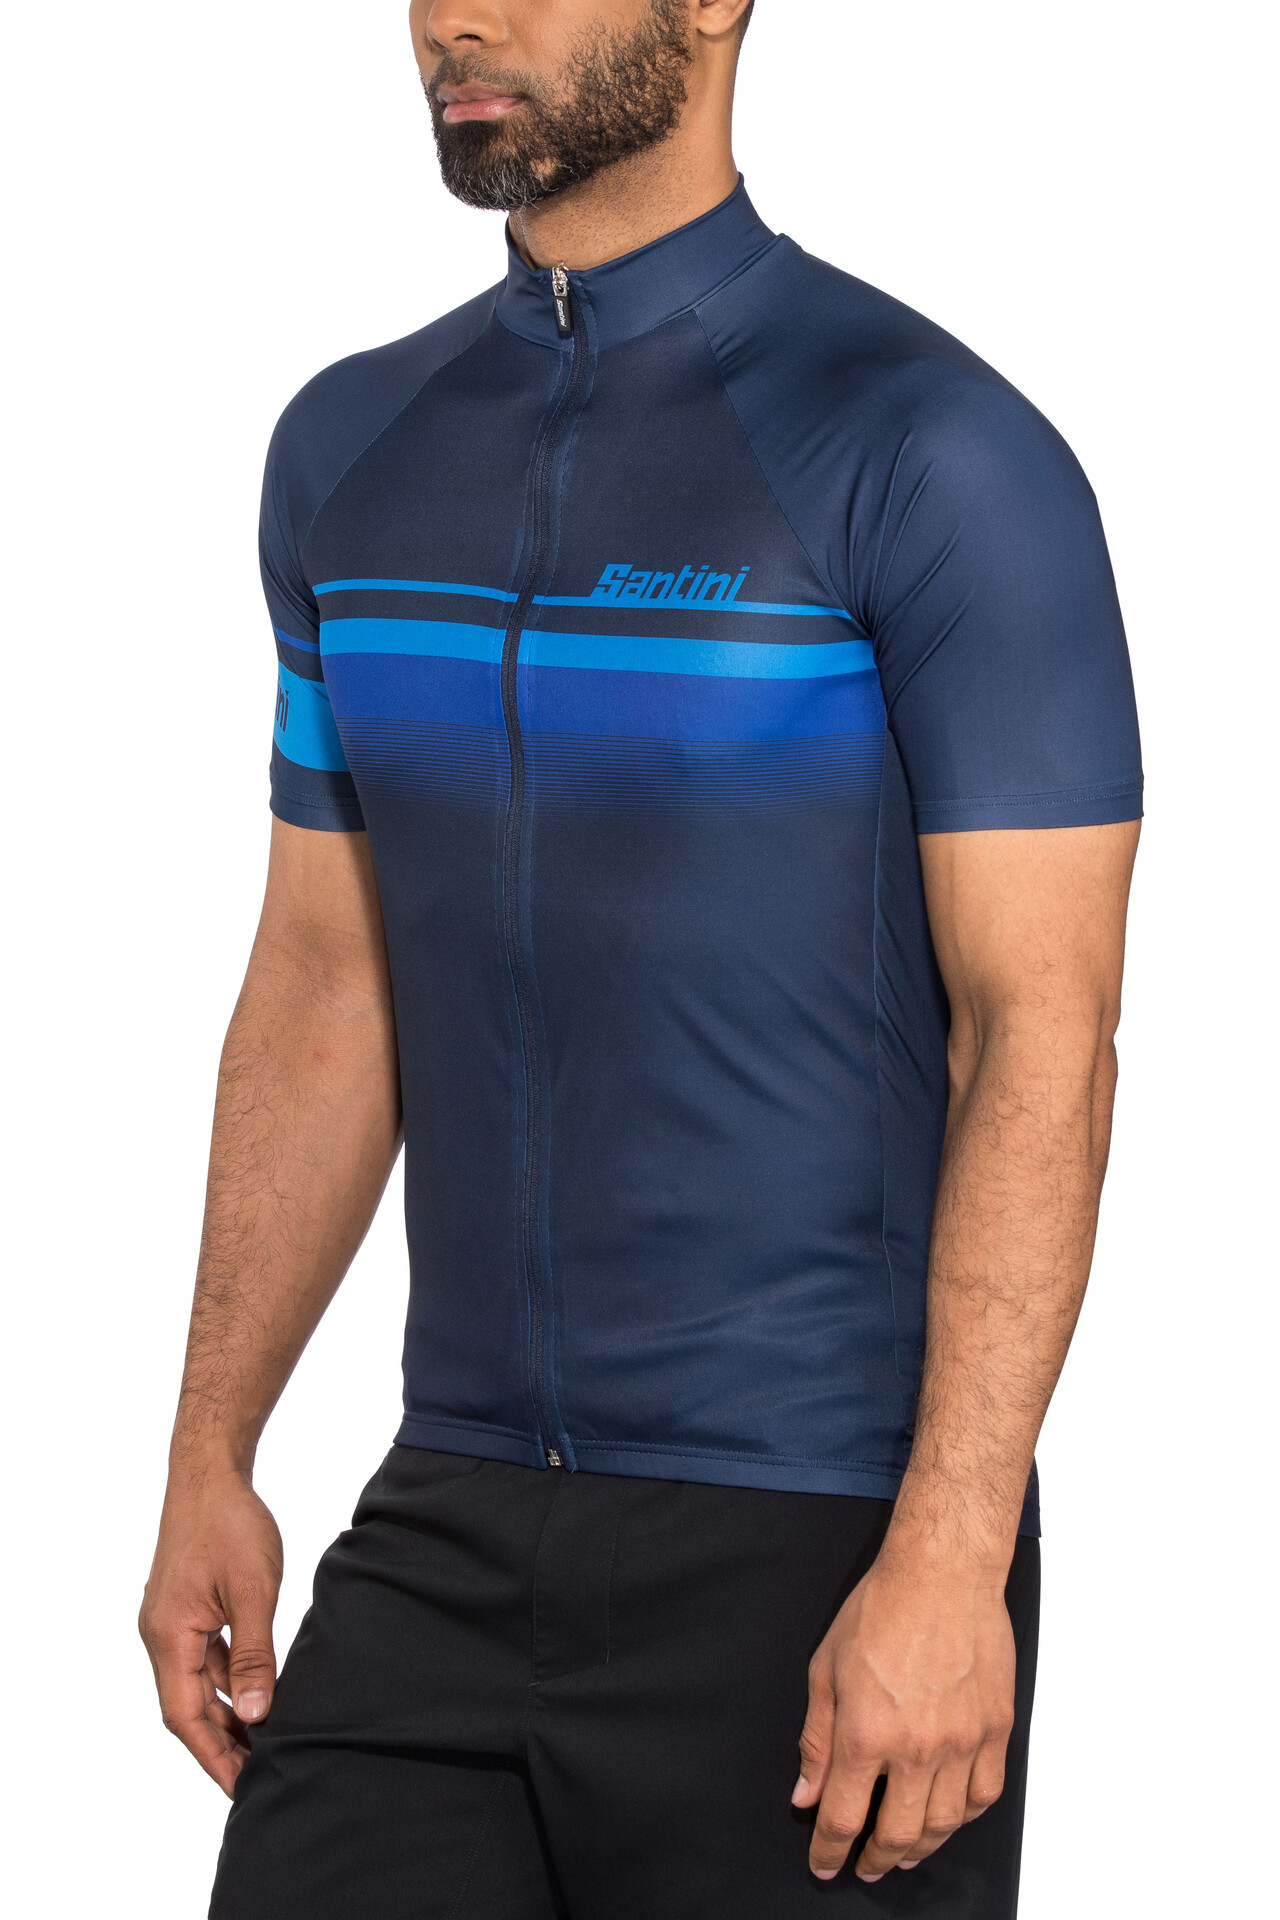 Italia Maillot de cyclisme en Royal Bleu Fabriqué en Italie par SANTINI